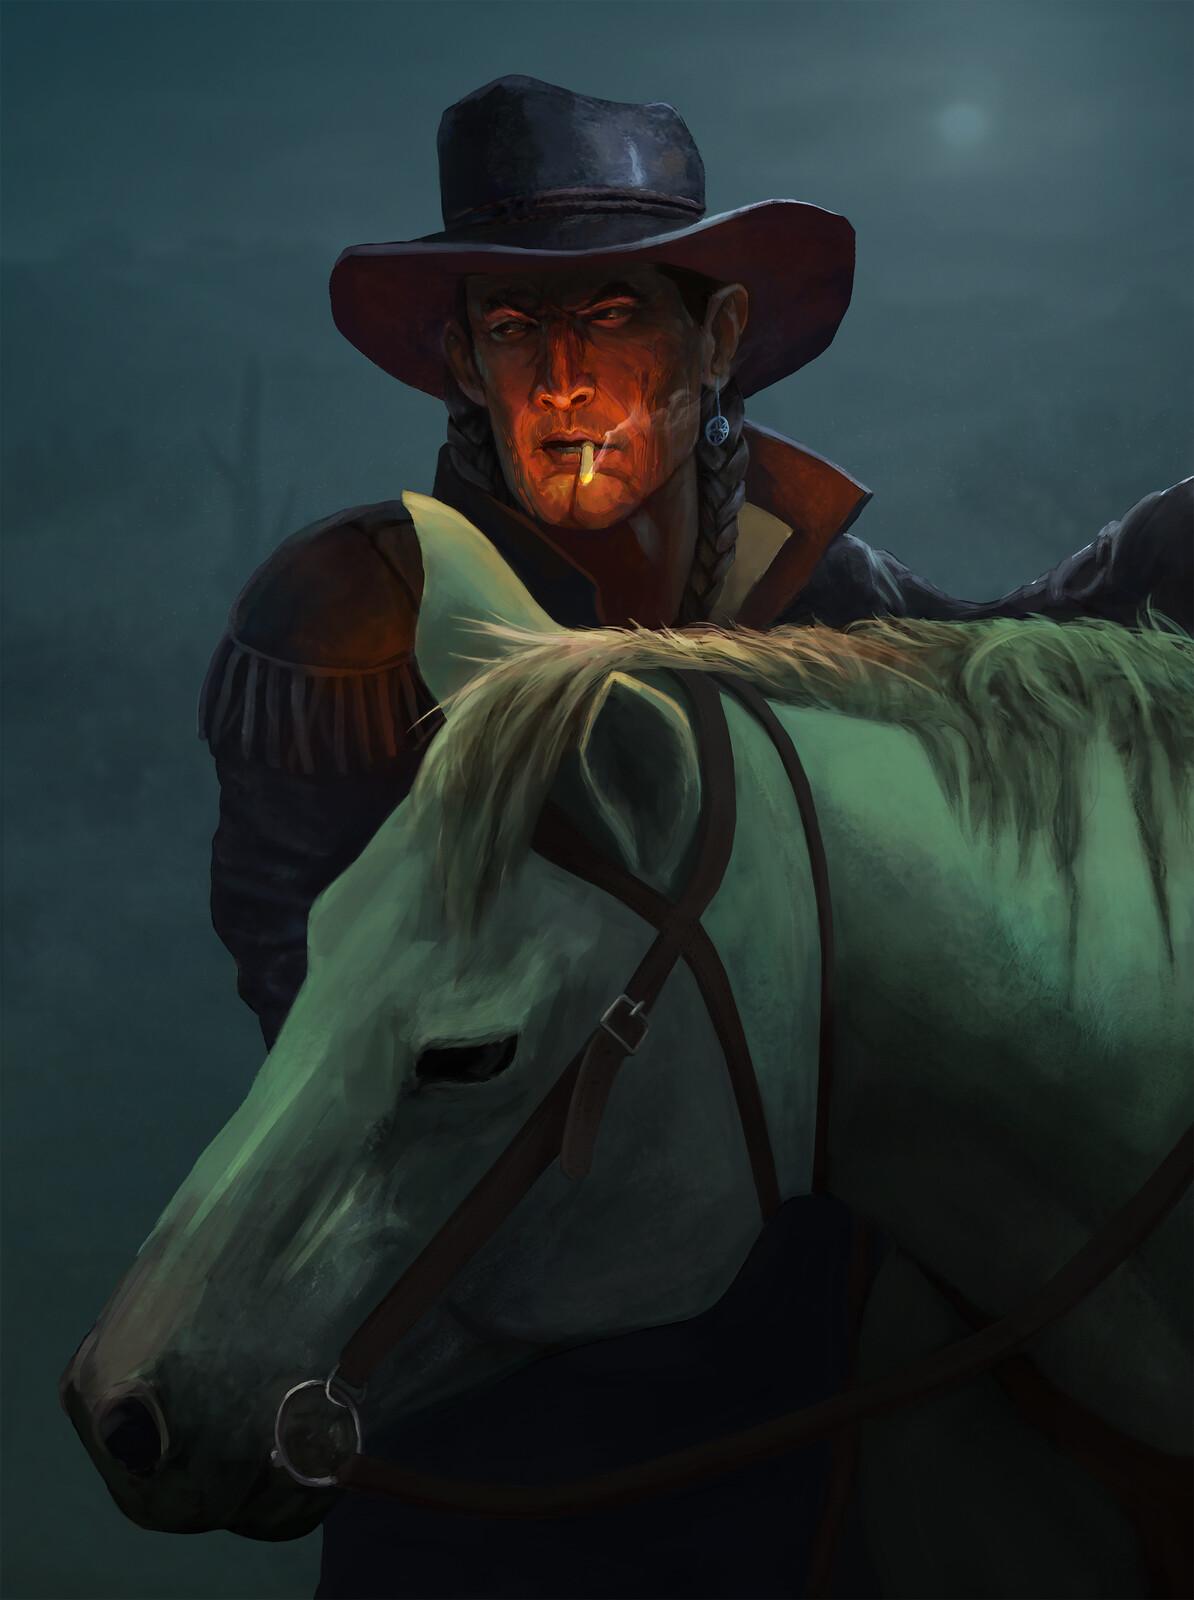 Moonlight Cowboy